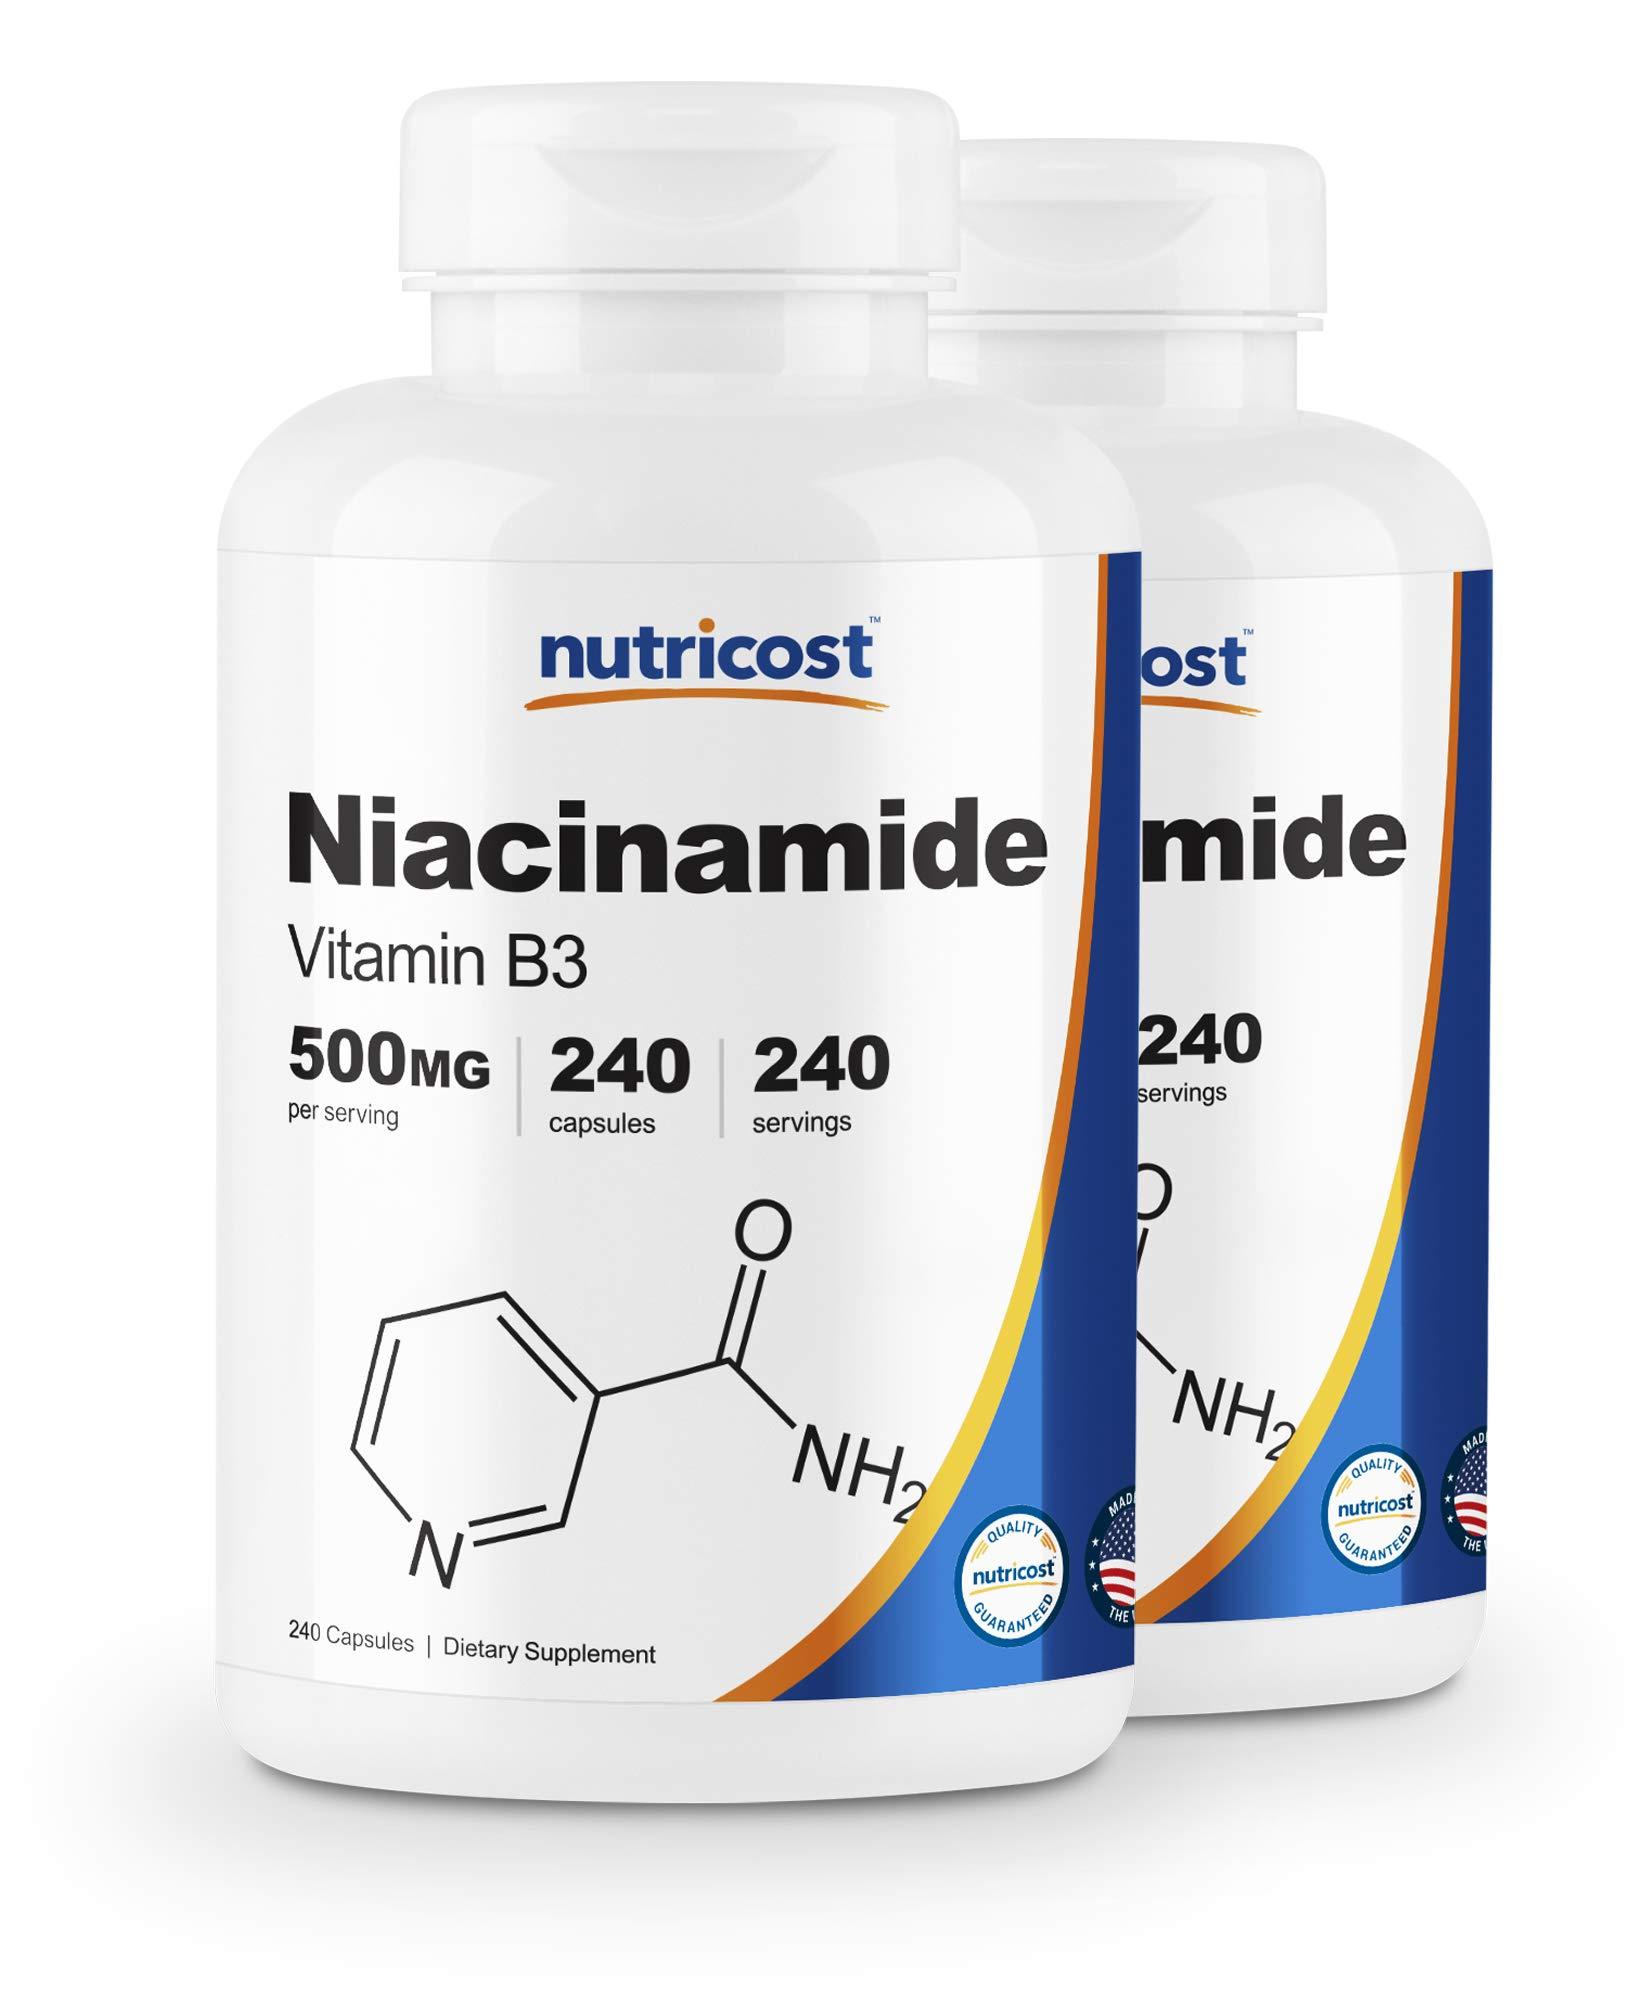 Nutricost Niacinamide (Vitamin B3) 500mg, 240 Capsules (2 Bottles)